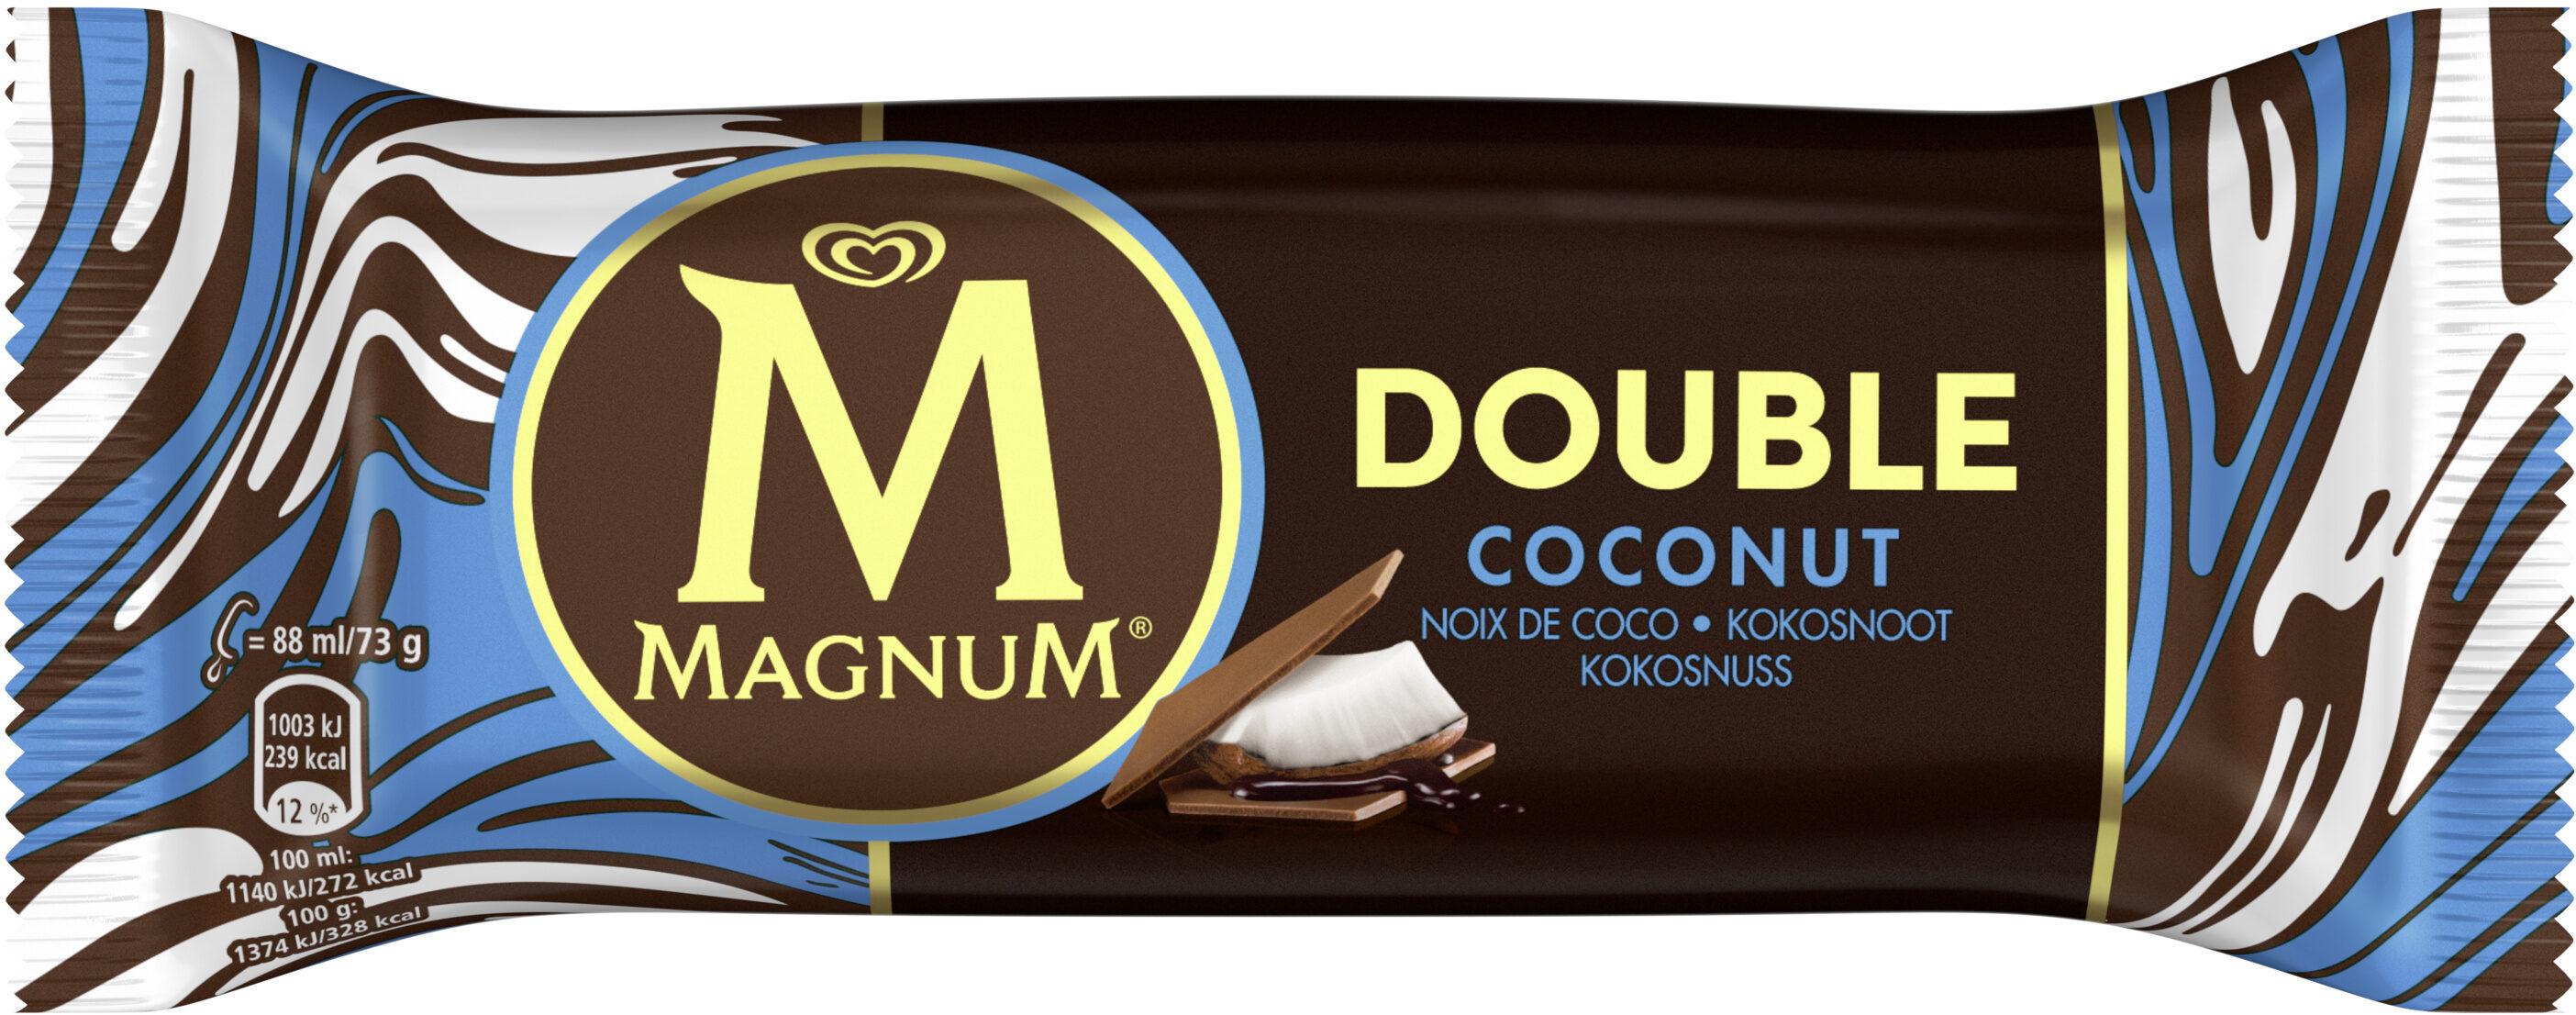 Magnum Batônnet Glace Double Coco 88ml - Prodotto - fr